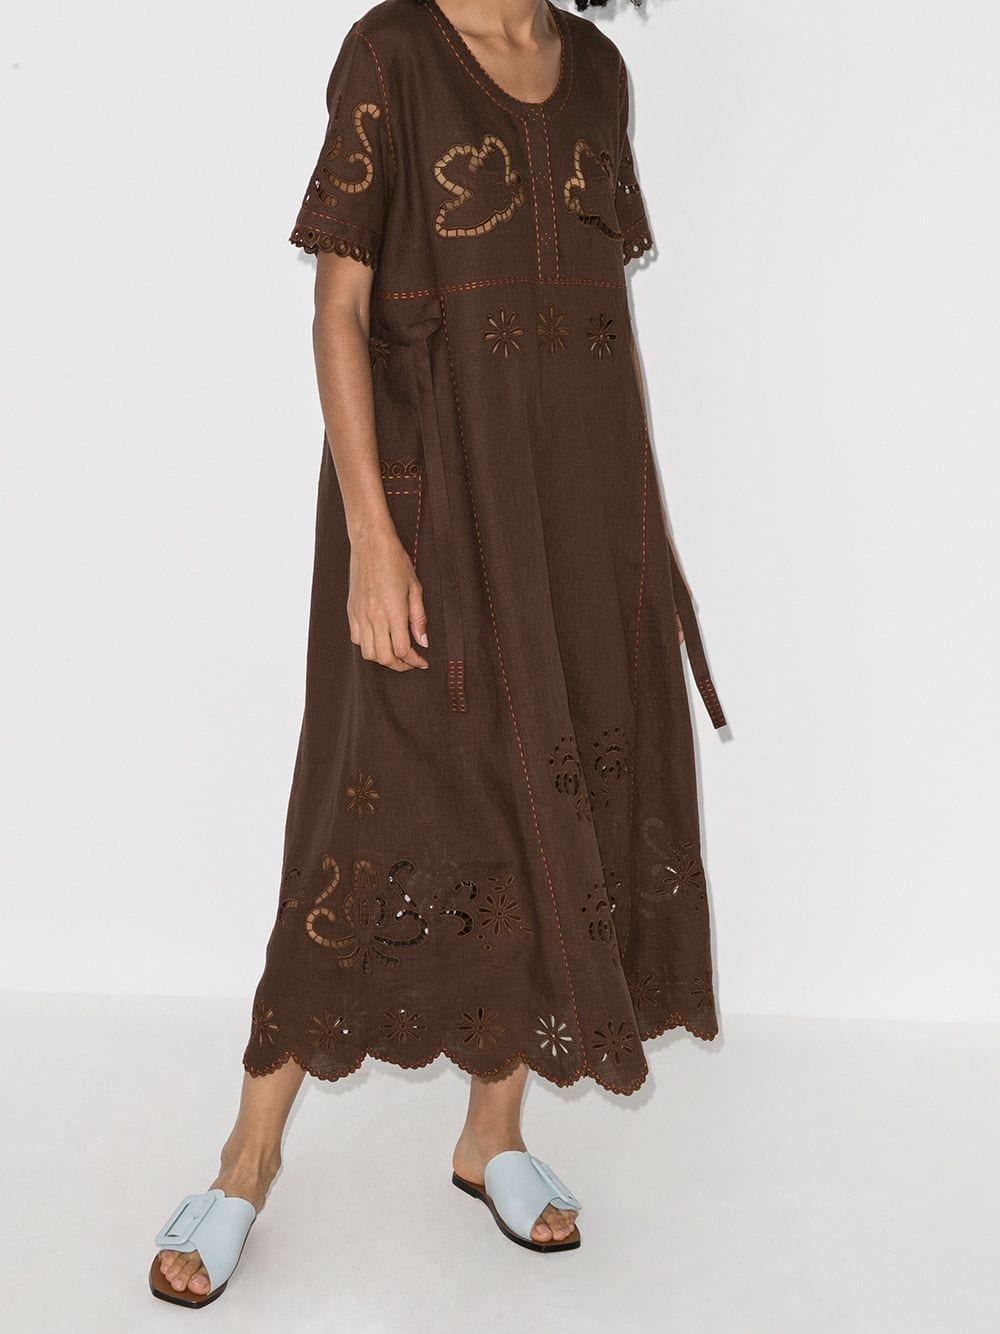 VITA KIN Love In The Air Kaftan Dress